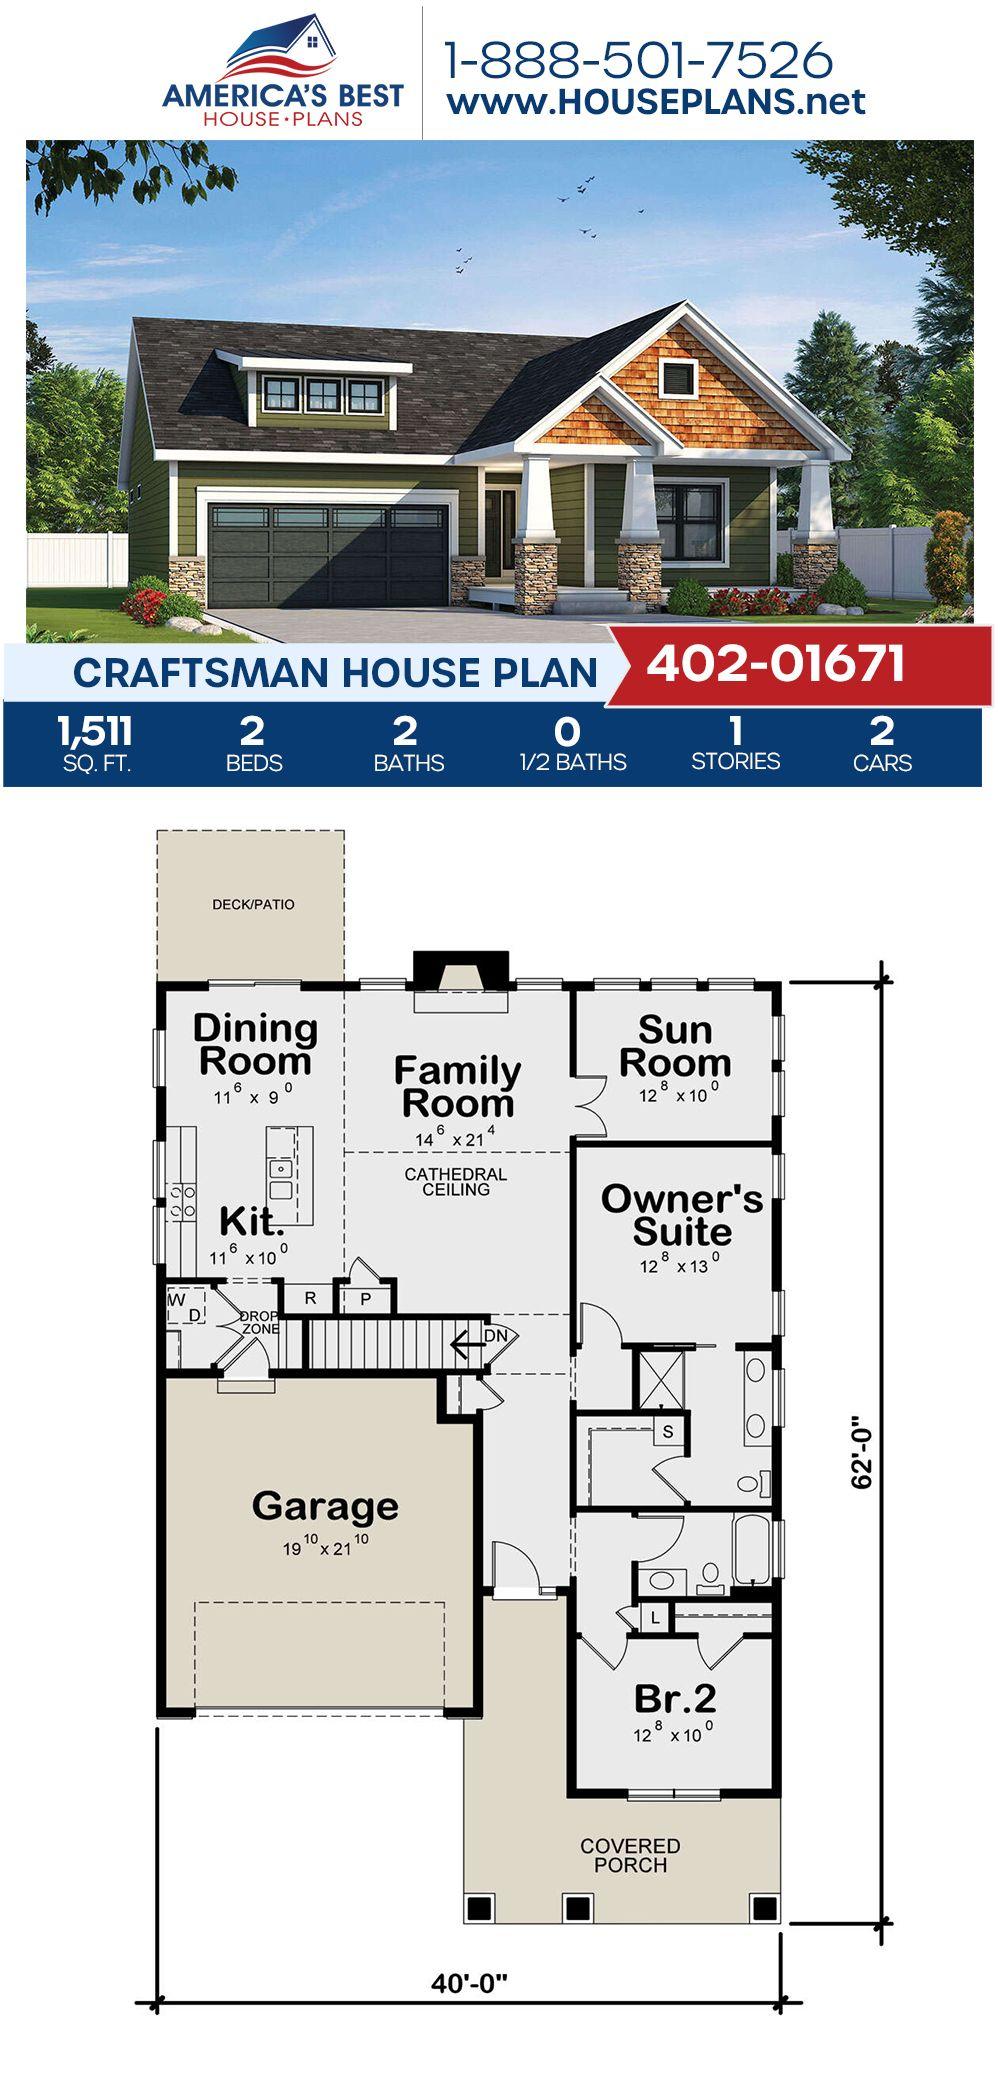 House Plan 402 01671 Craftsman Plan 1 511 Square Feet 2 Bedrooms 2 Bathrooms In 2020 Craftsman House Plans Craftsman House House Plans